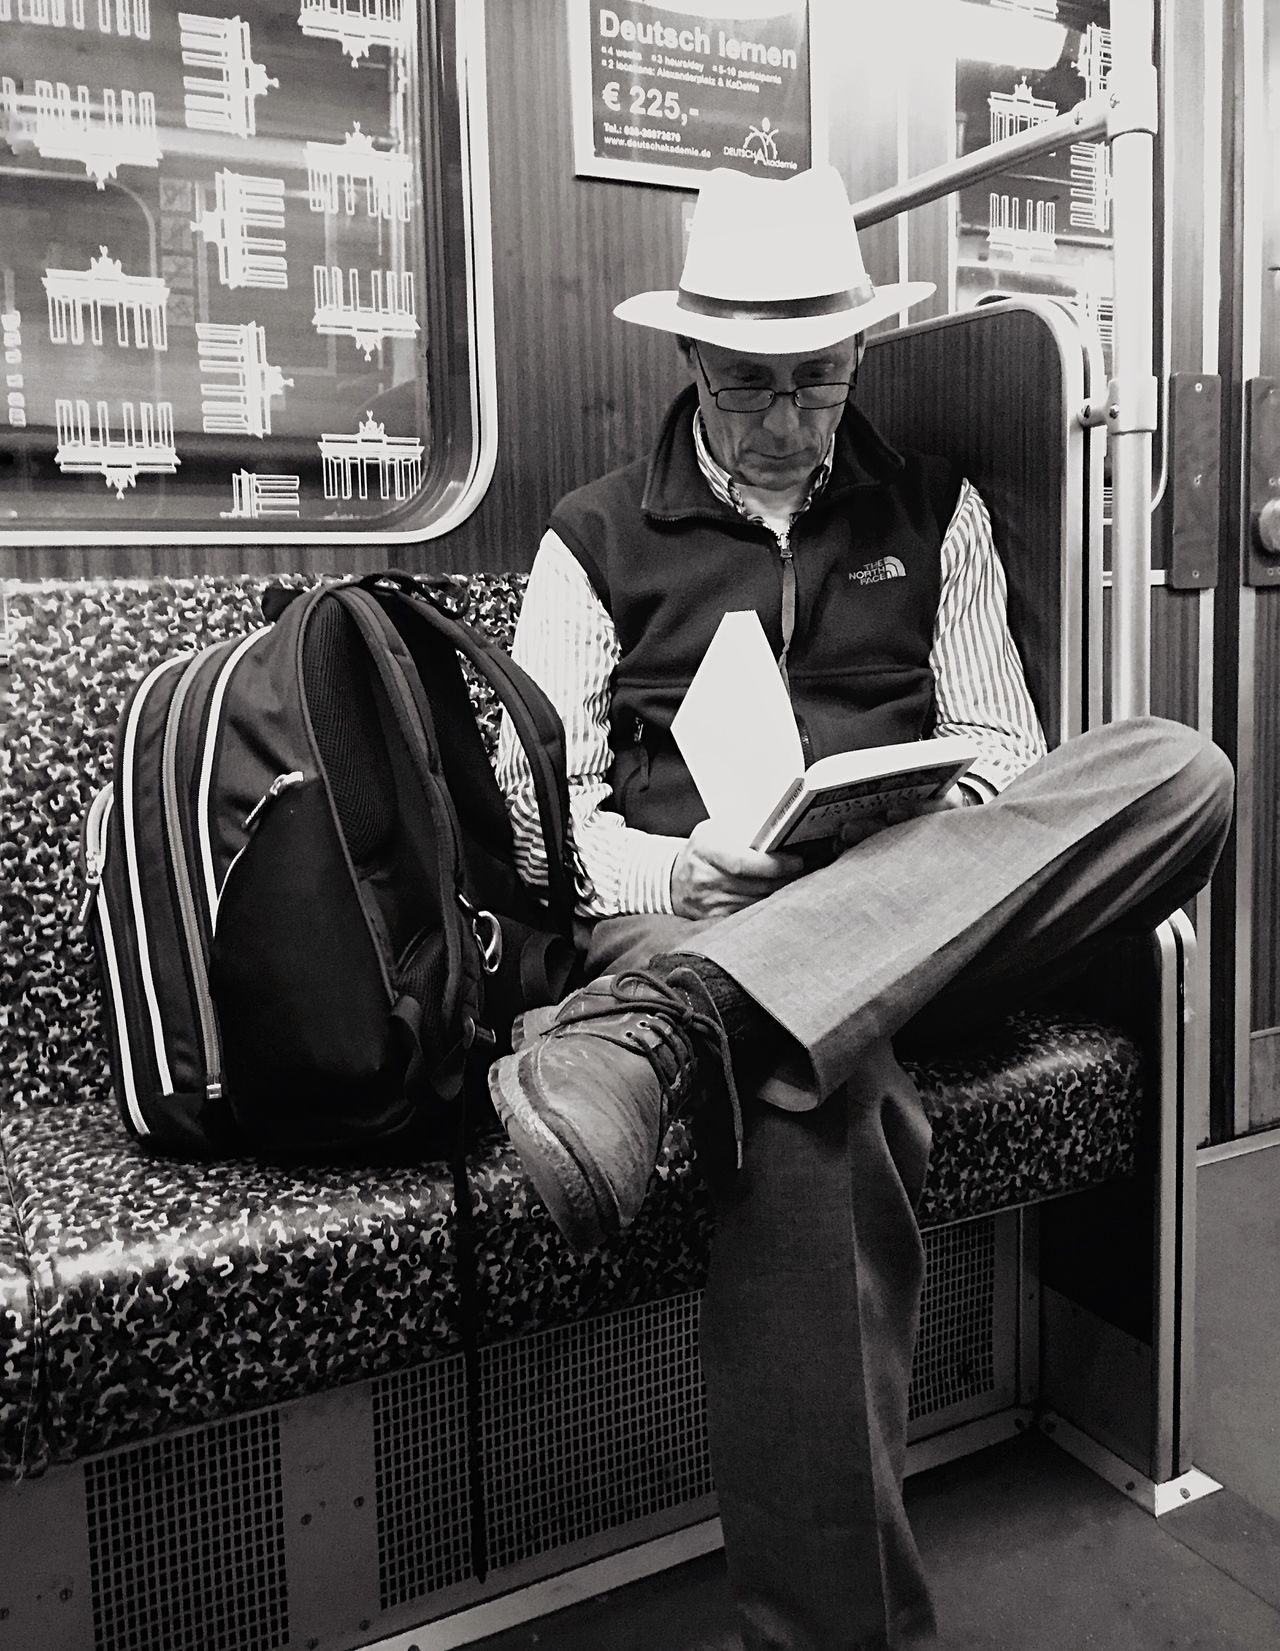 Streetphotography Portrait Mpro Blackandwhite Berlin Open Edit Mobilephotography.de The Street Photographer - 2015 EyeEm Awards Shades Of Grey